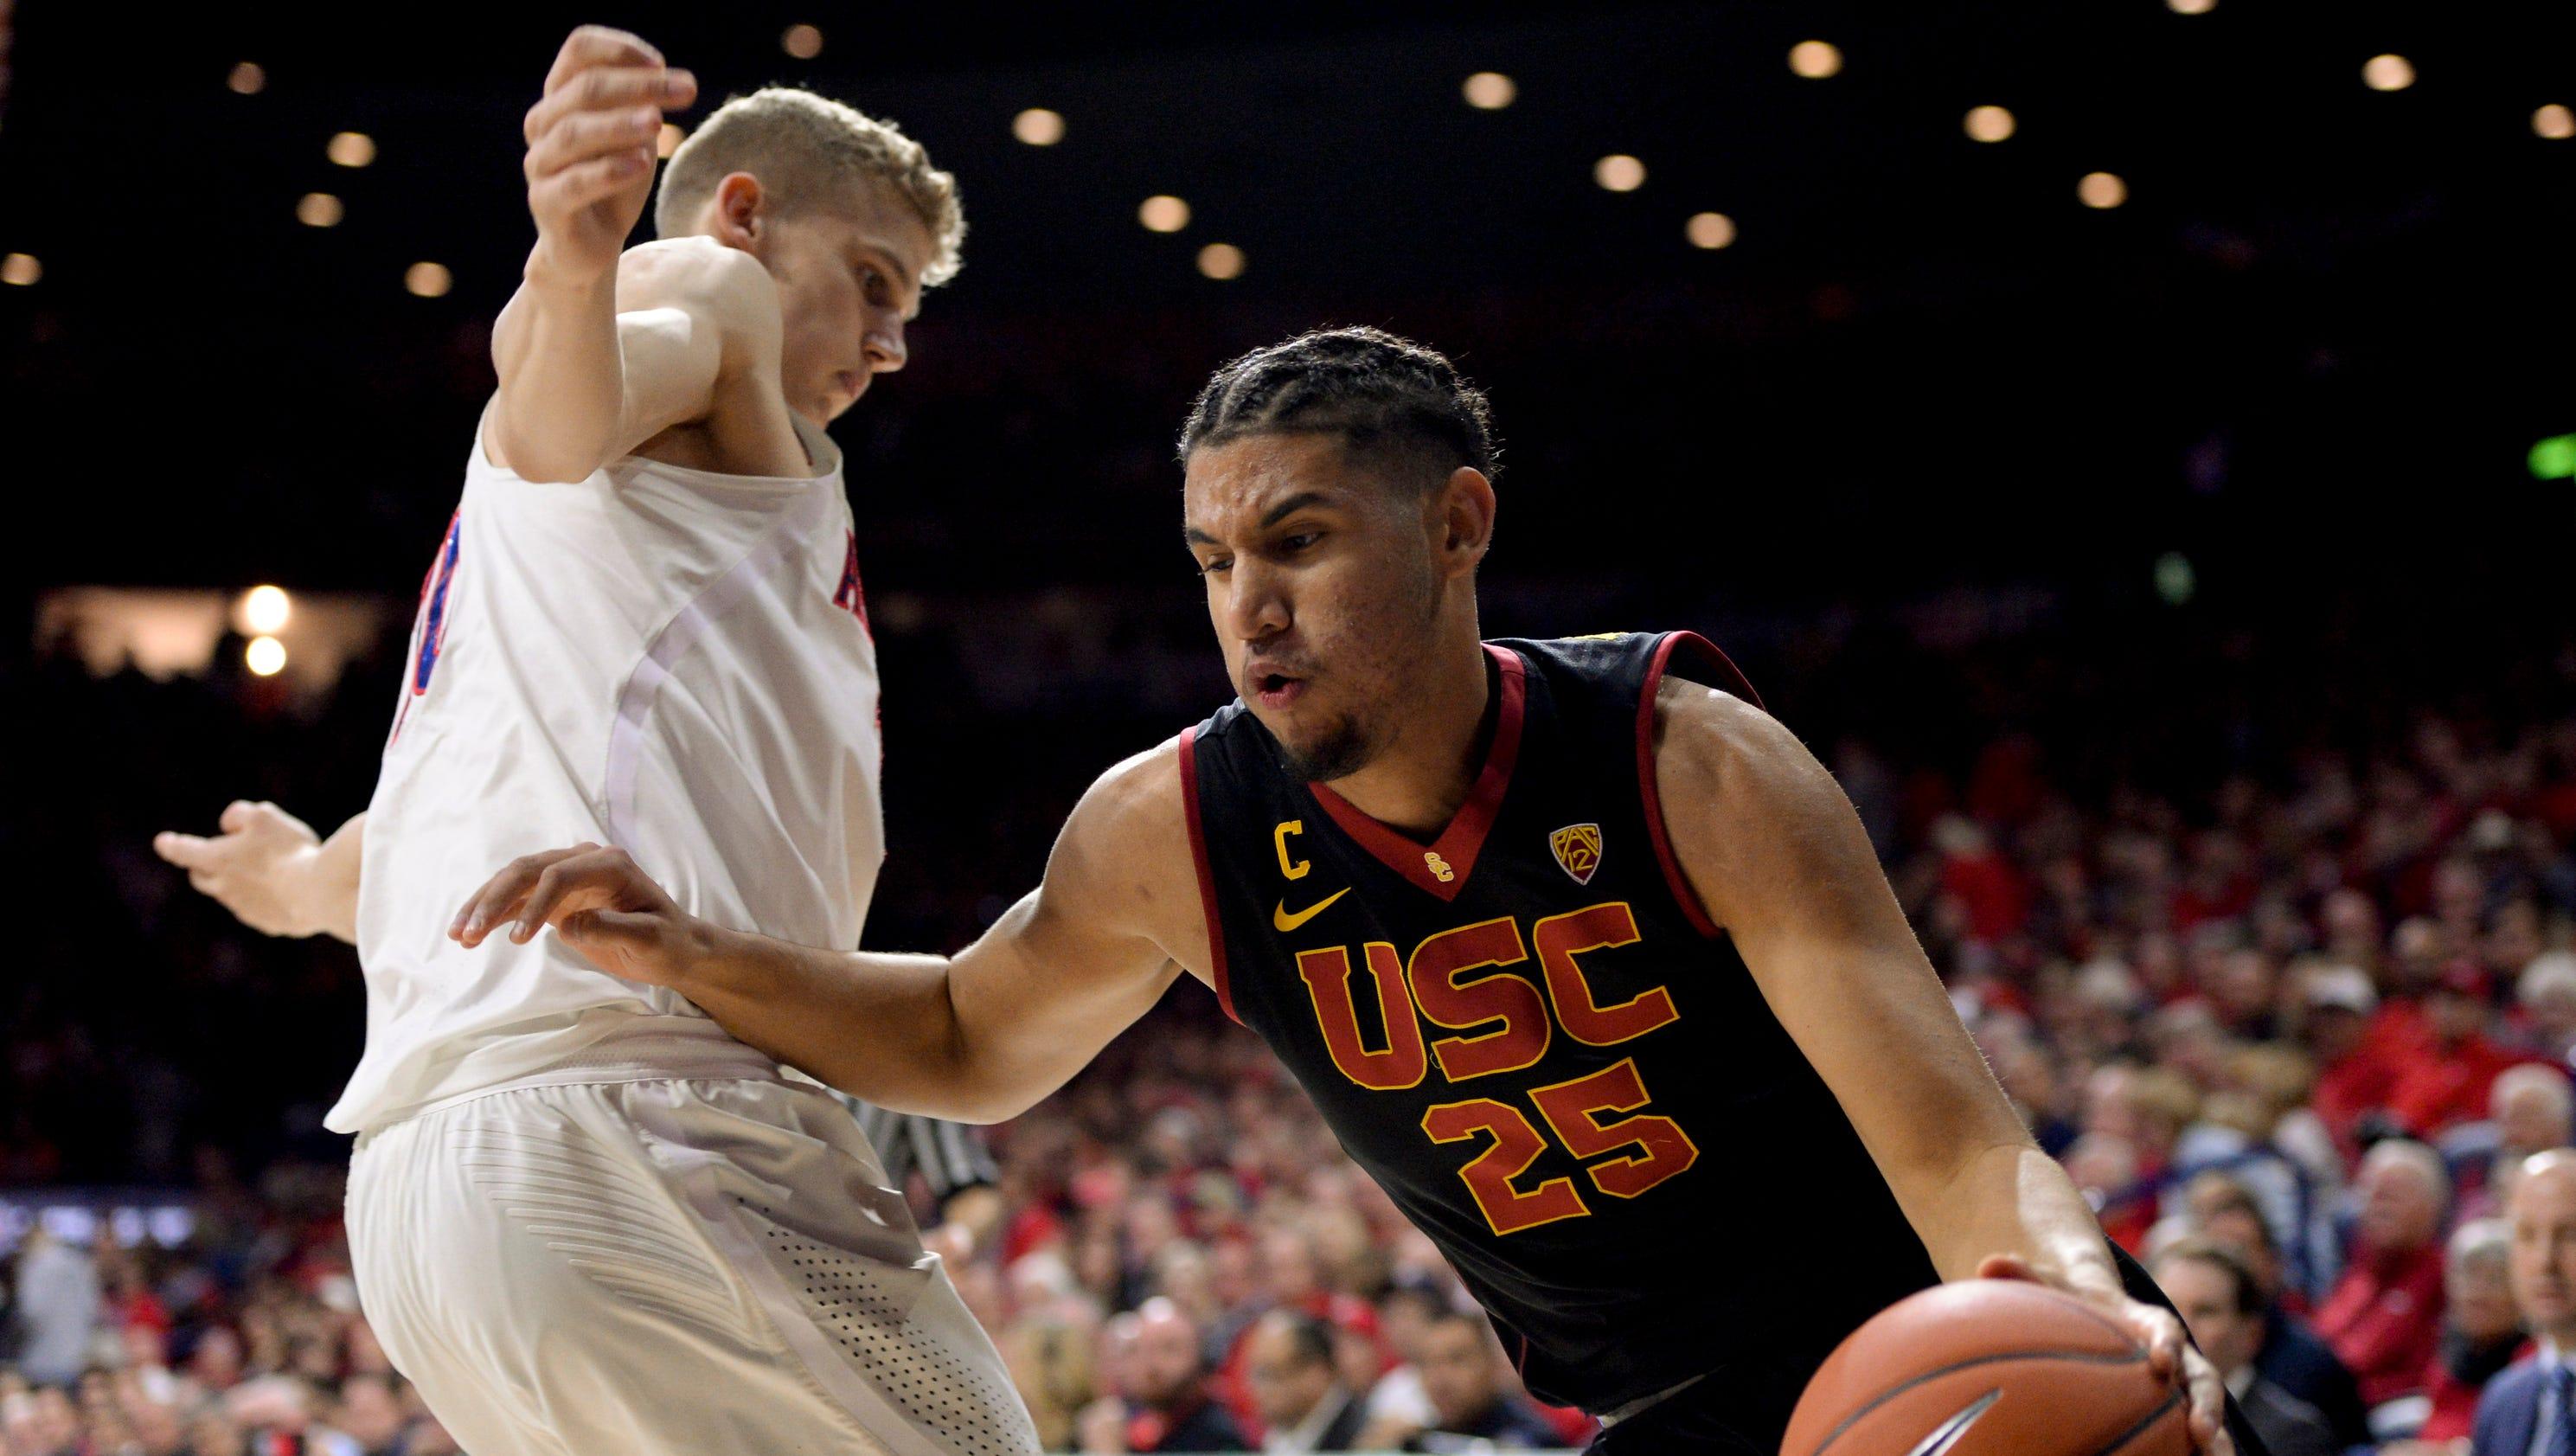 Arizona Wildcats men's basketball vs. USC